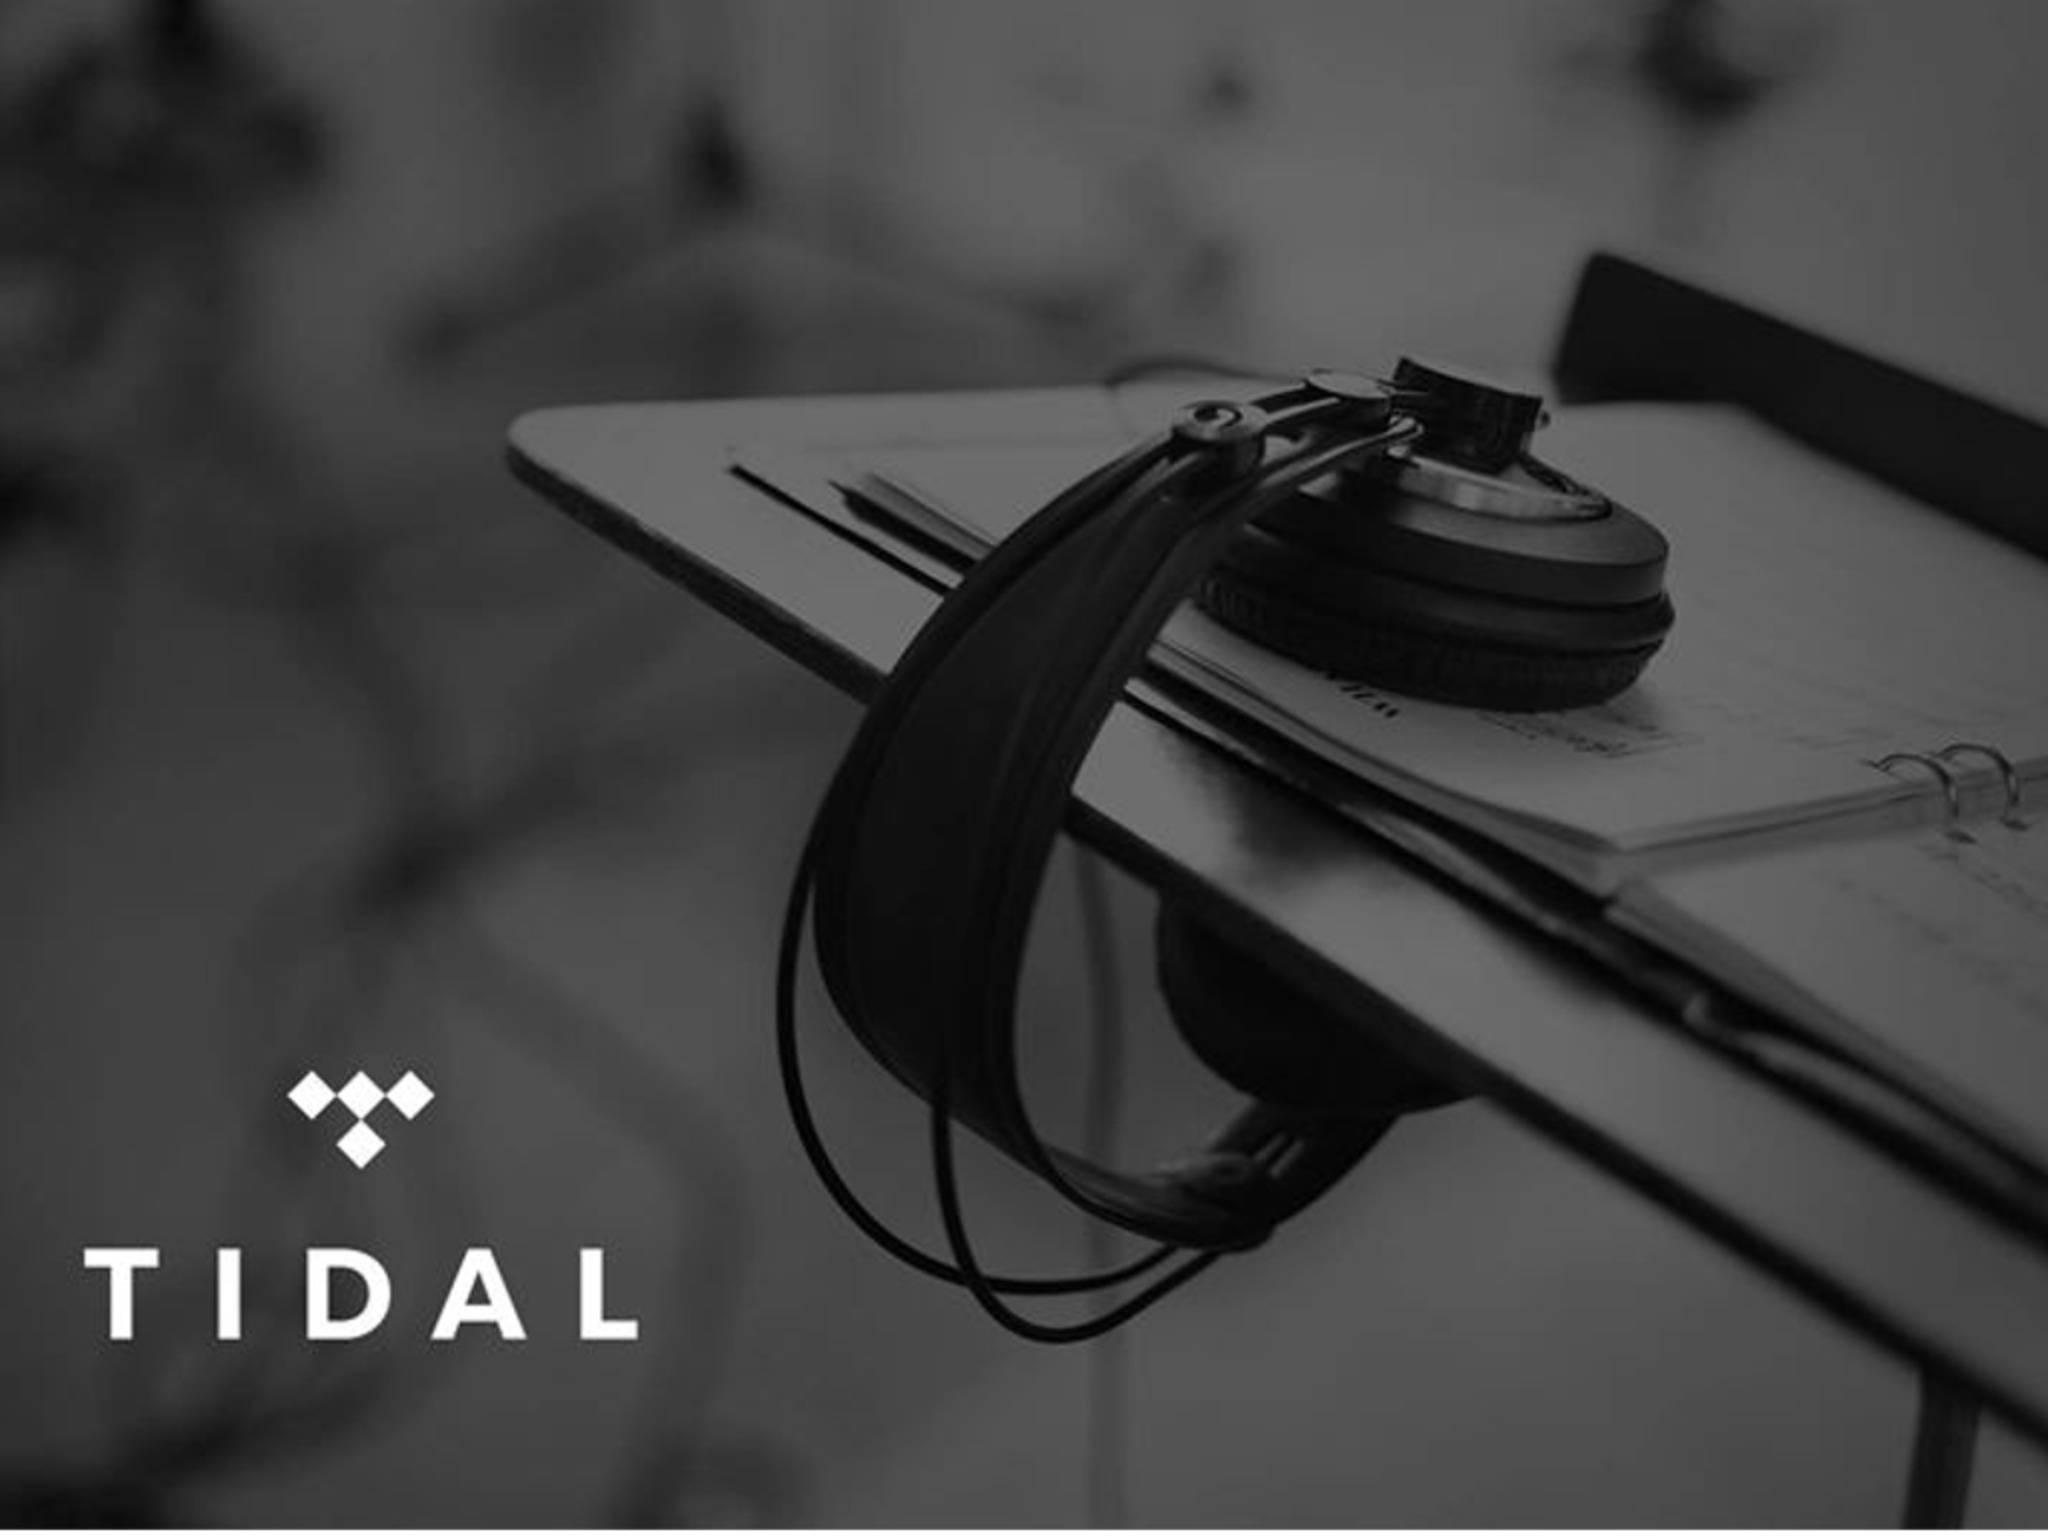 Apple ist angeblich am Streaming-Dienst Tidal des Rappers Jay Z interessiert.